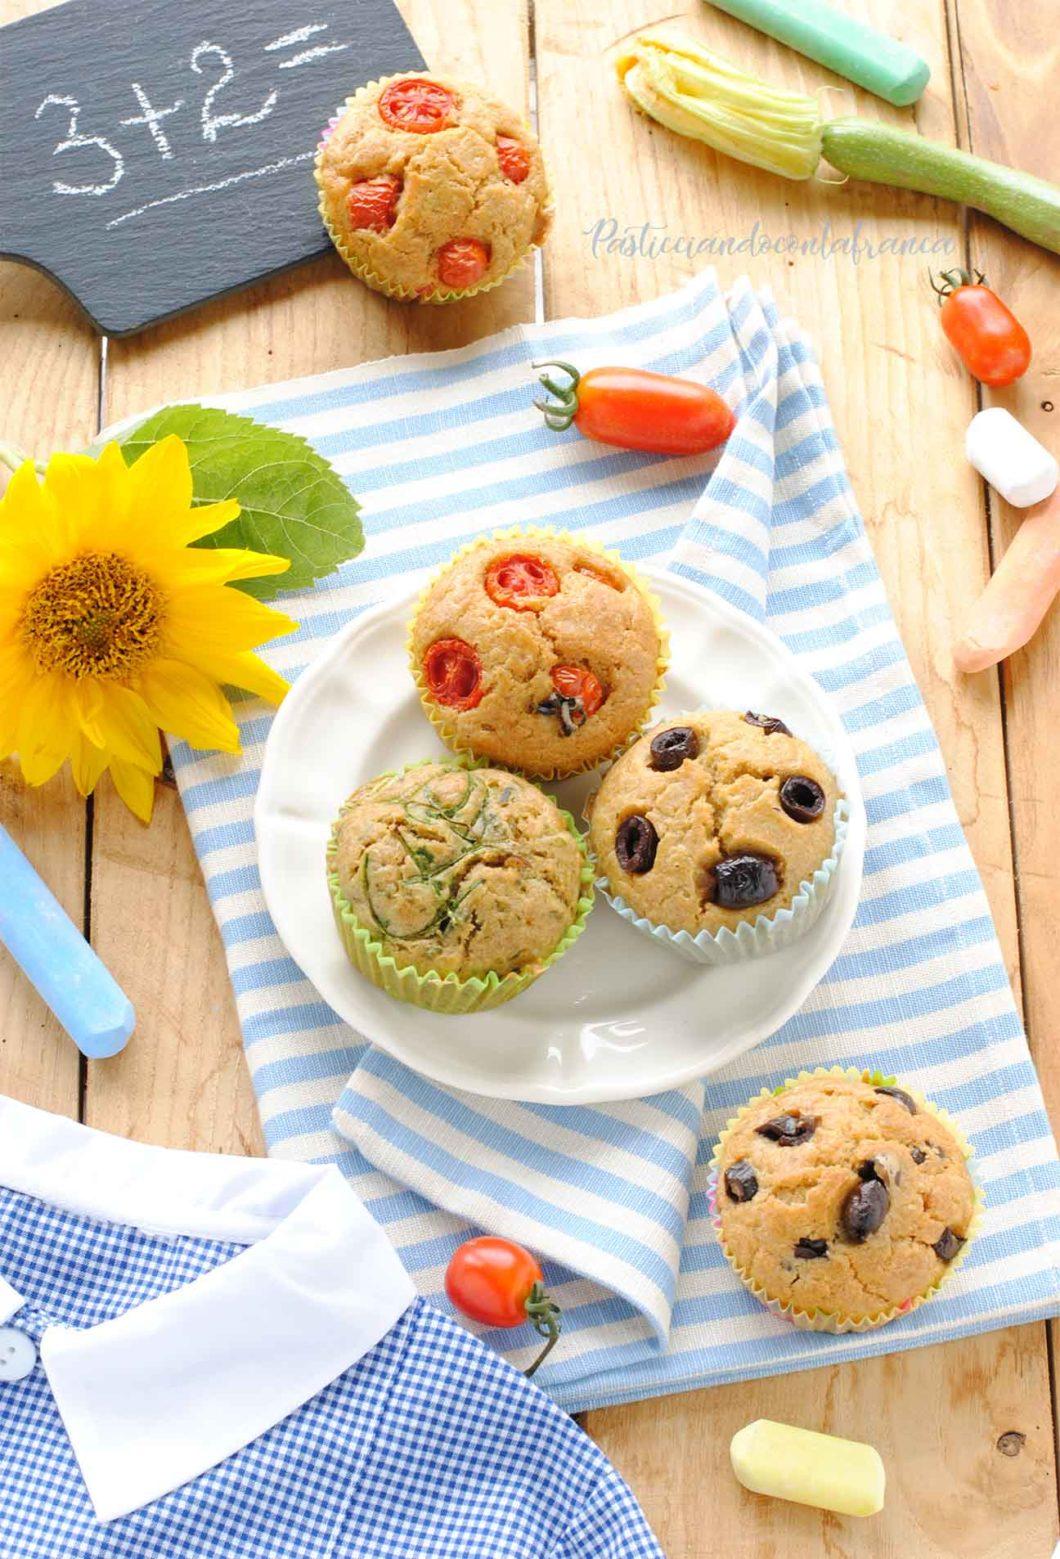 muffin salati vegan ricetta di pasticciandoconlafranca